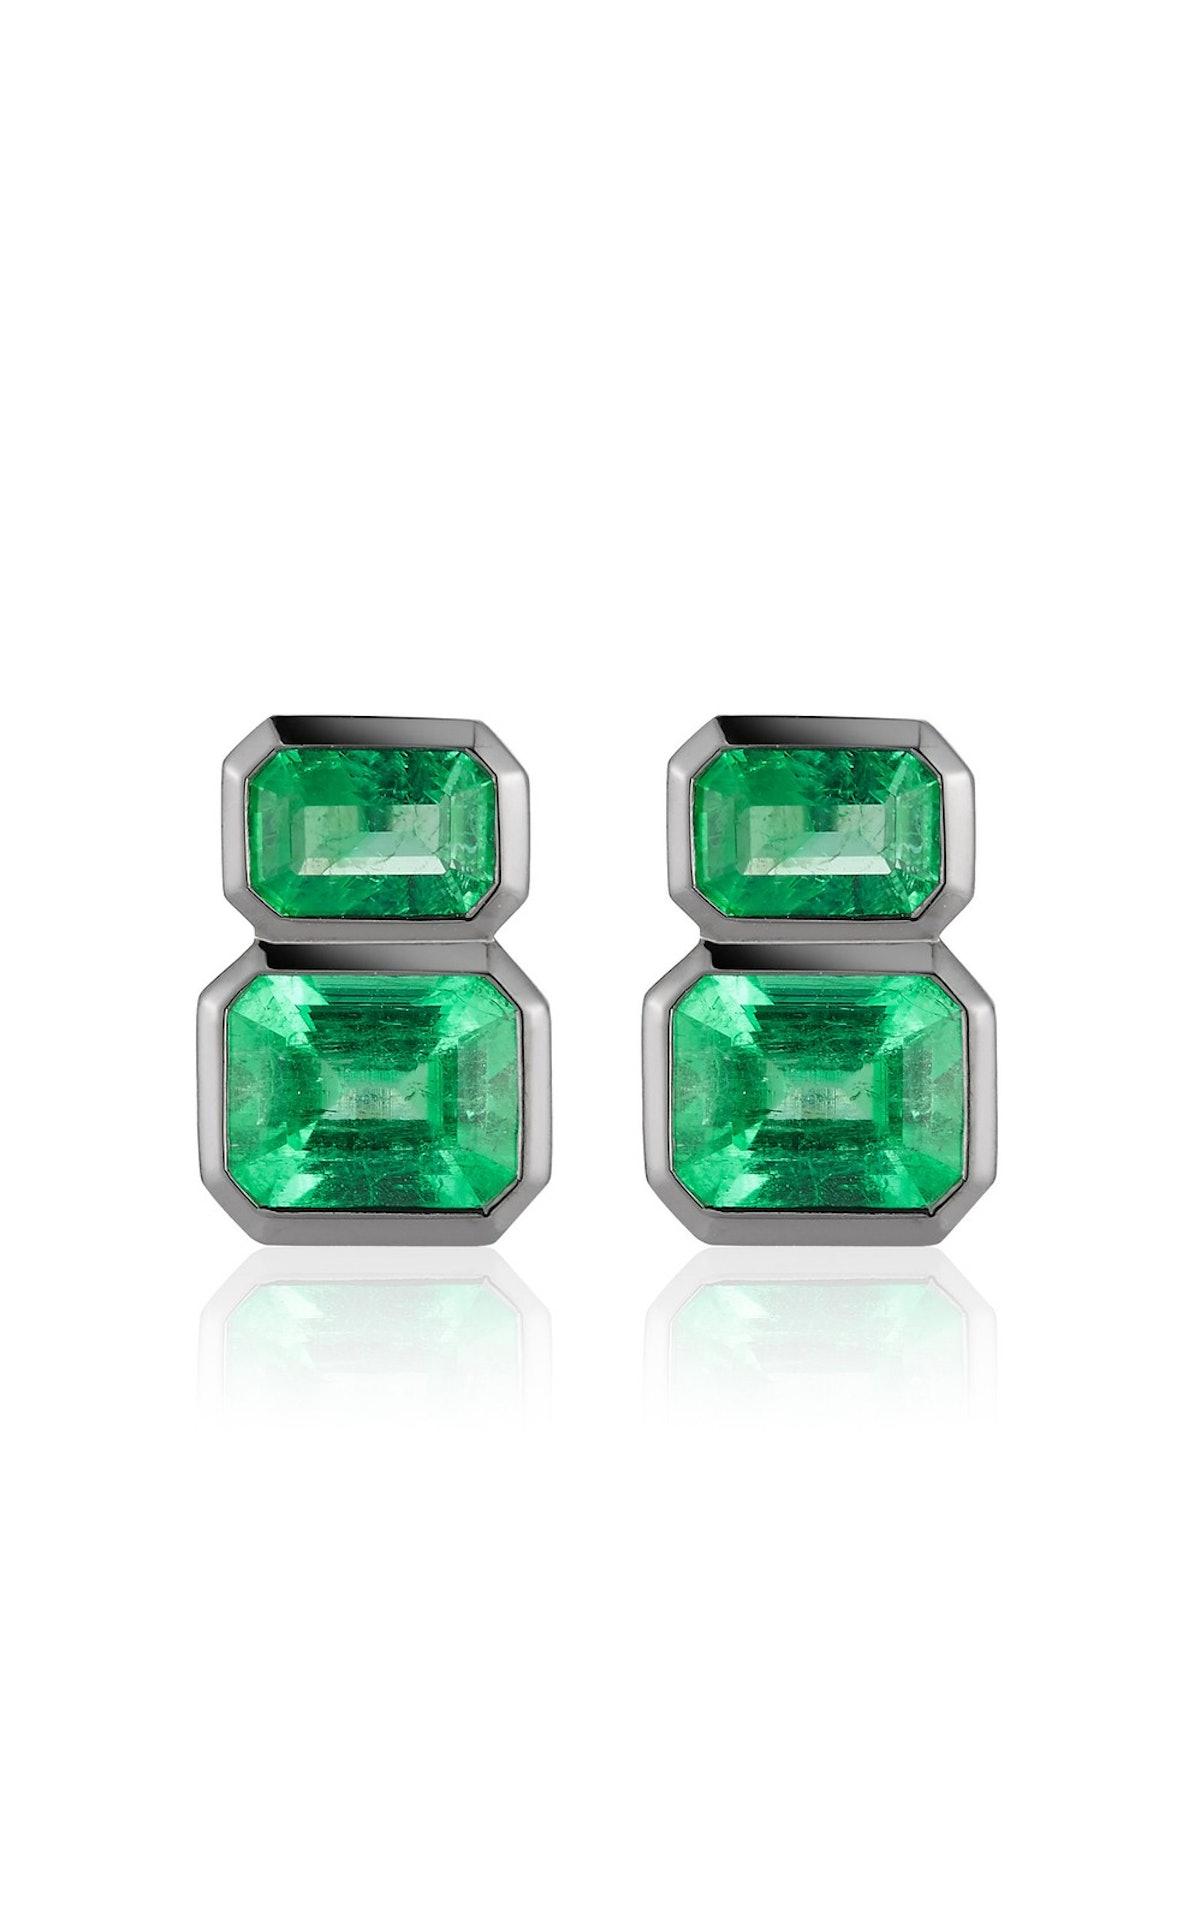 Darkened 18K White Gold And Muzo Emerald Earrings